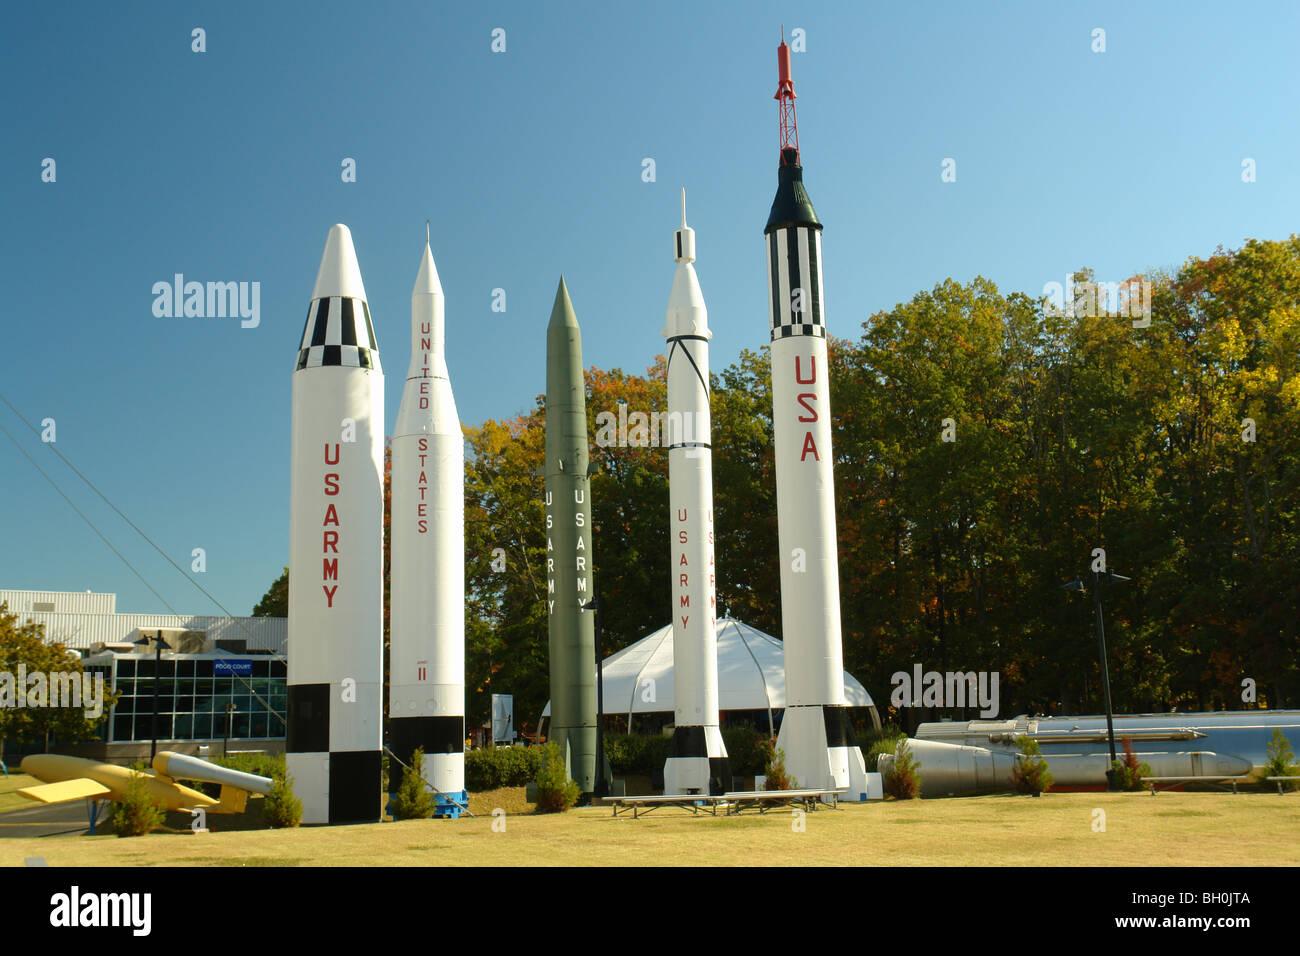 alabama nasa space ride - photo #43